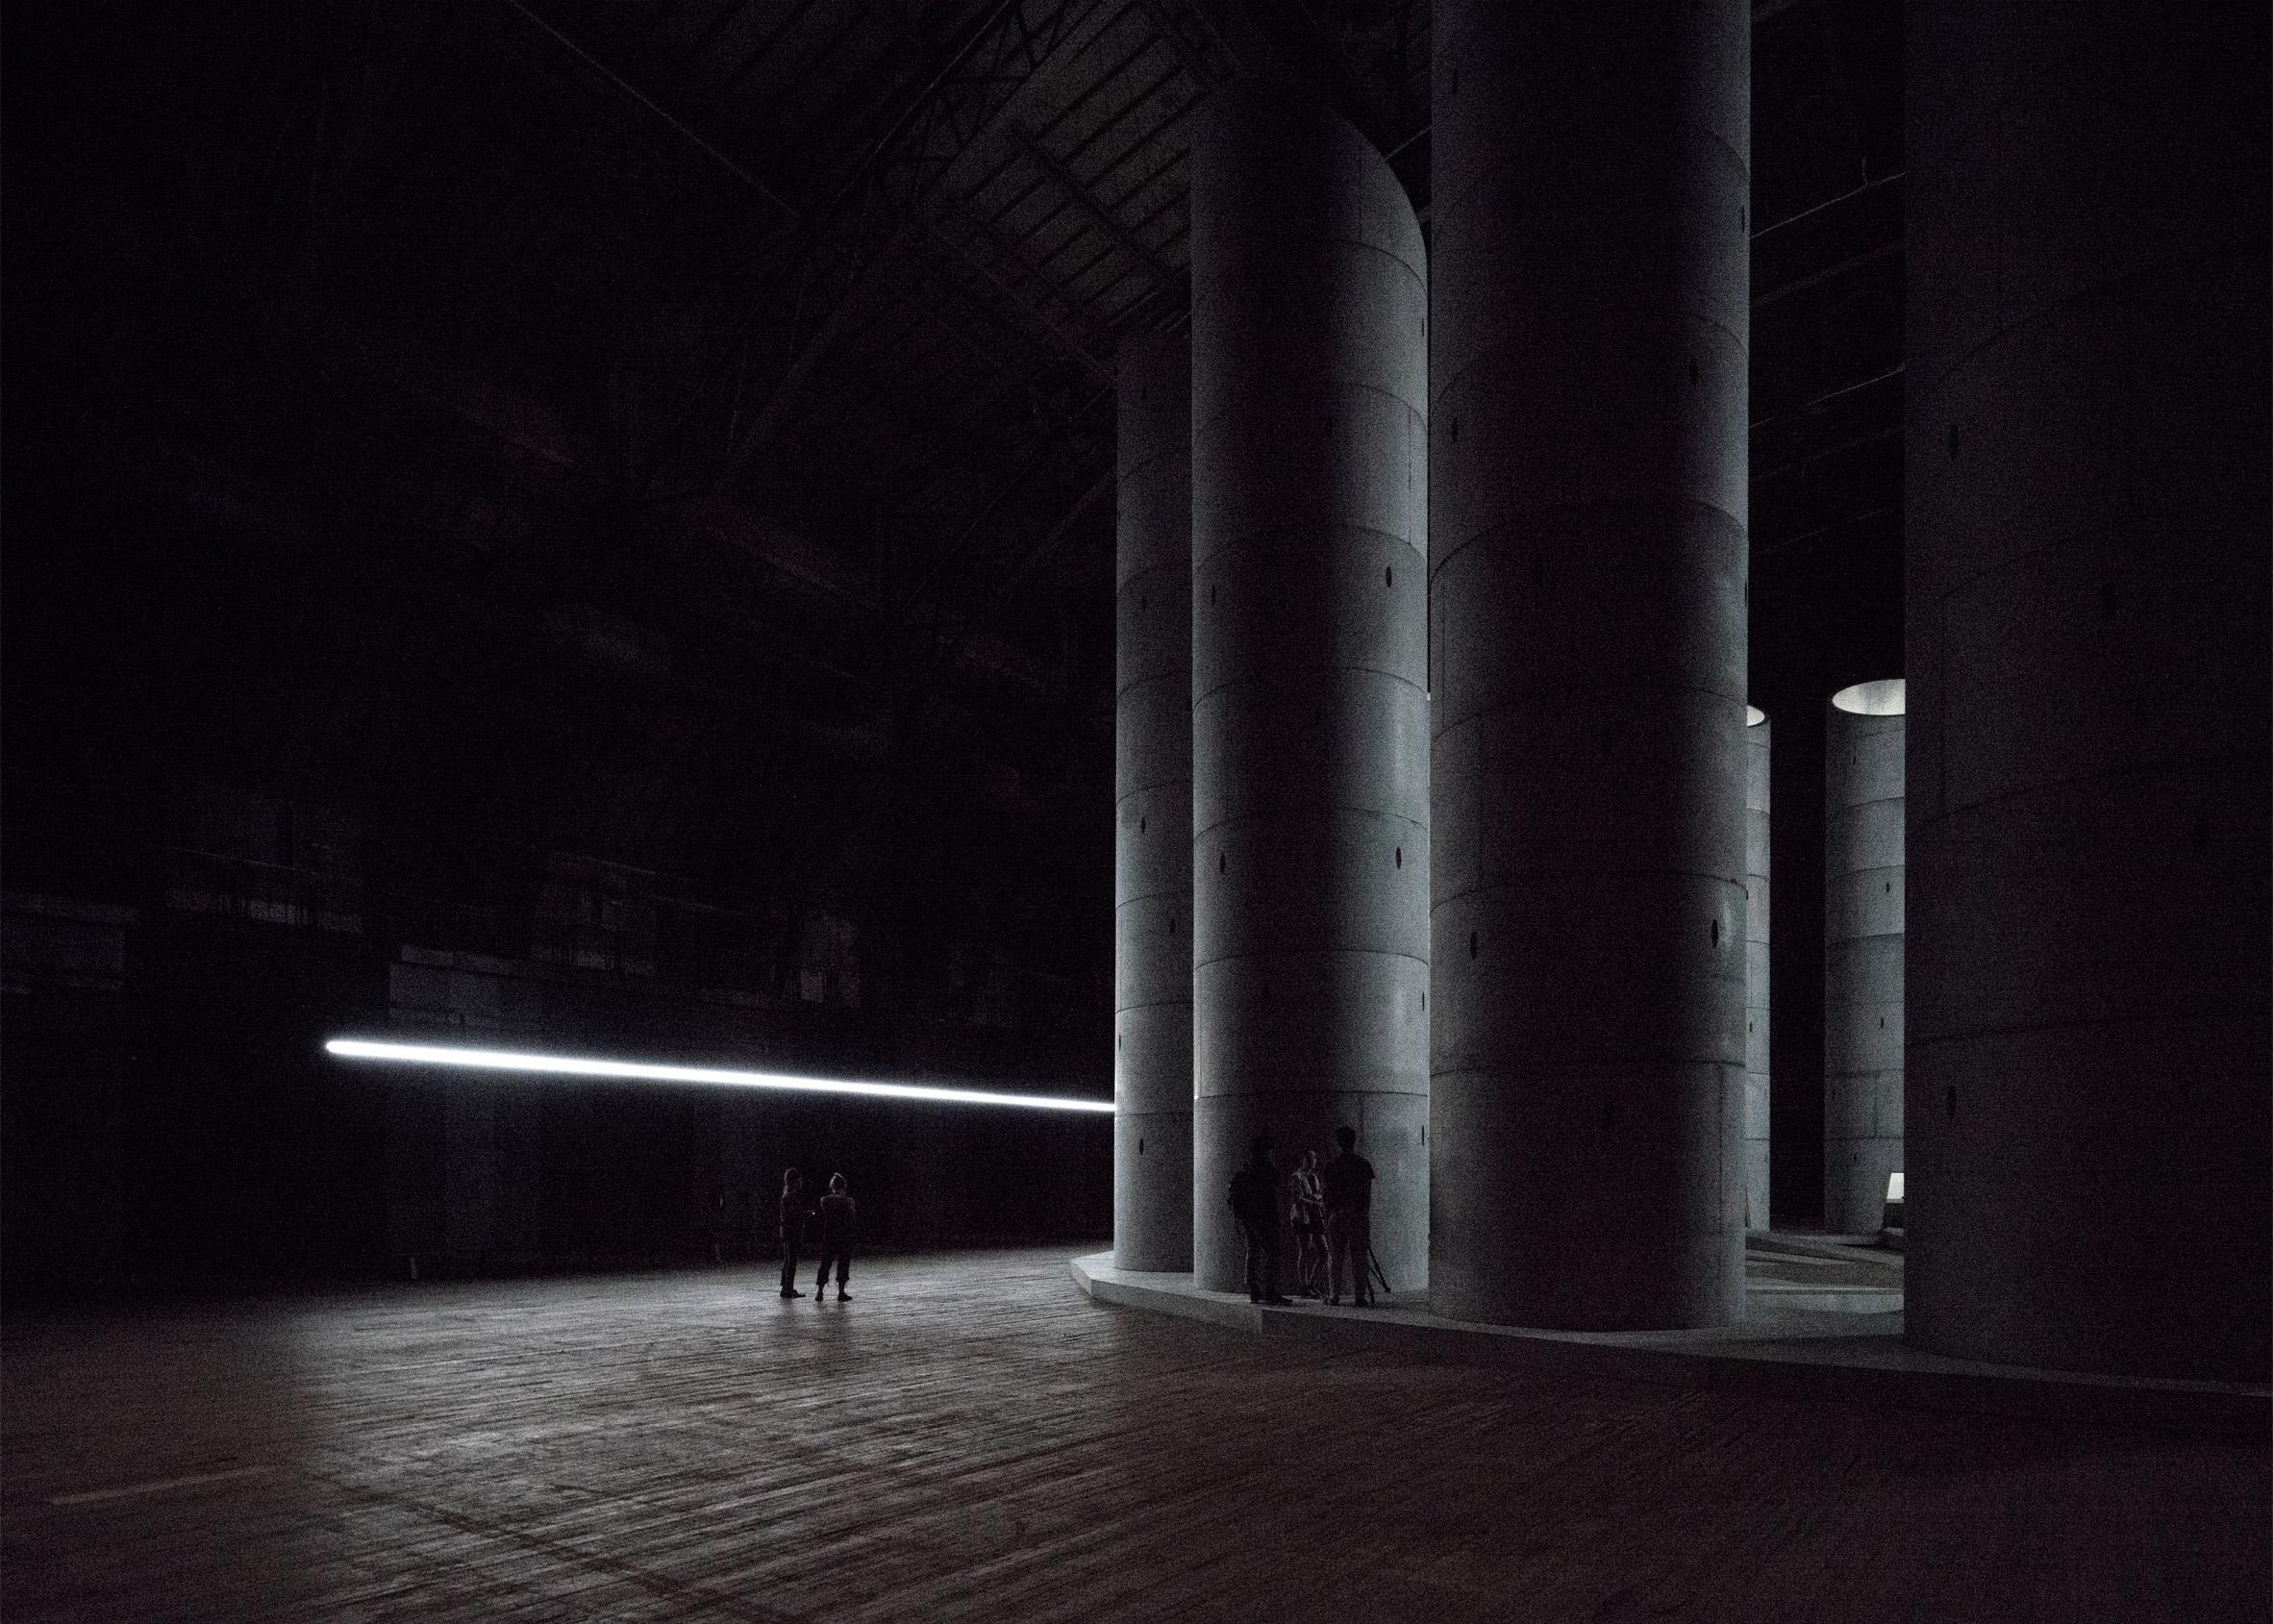 An Occupation of Loss by OMA/Shohei Shigematsu with Taryn Simon